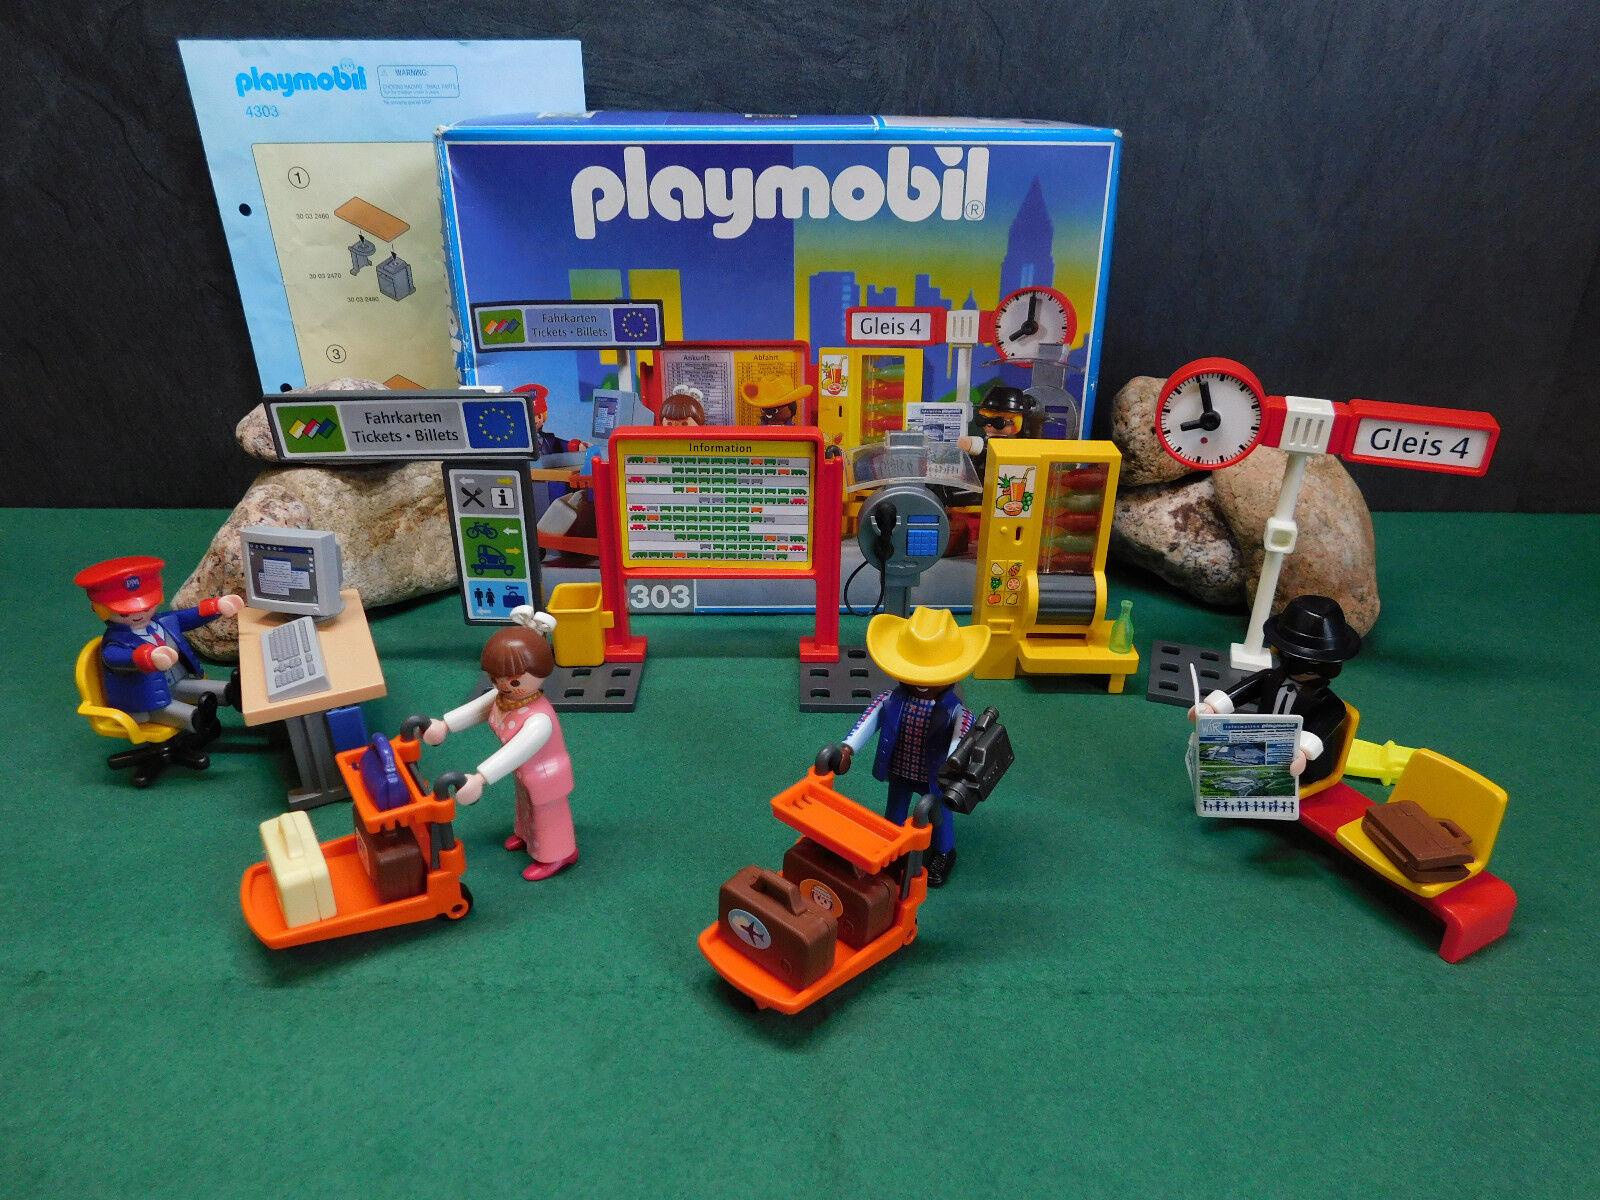 Playmobil Playmobil Playmobil Rarität Bahnhofseinrichtung 4303-A 1999 mit gel. BA und OVP 3545ca